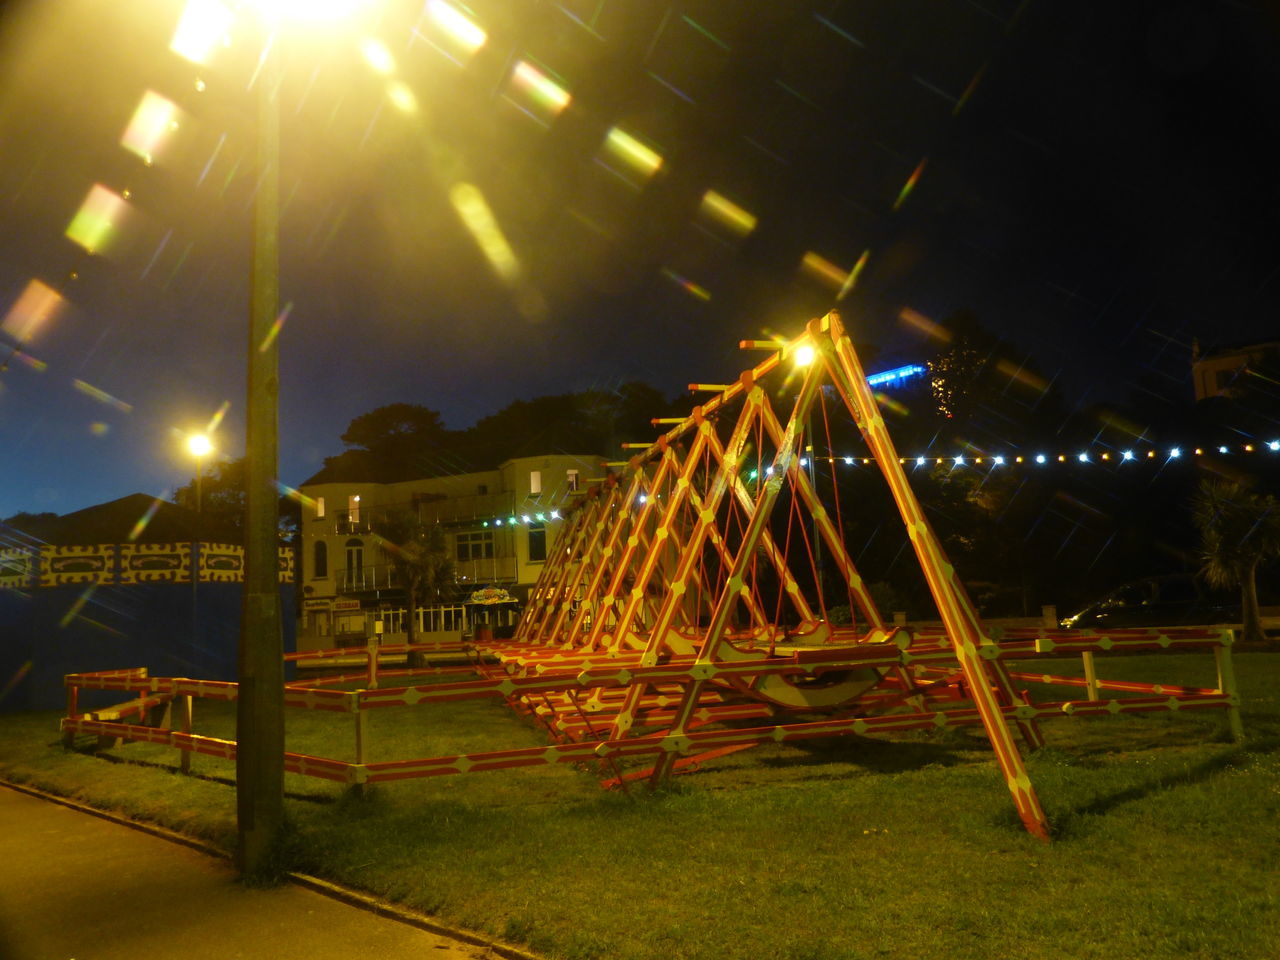 night, illuminated, built structure, lighting equipment, no people, architecture, light beam, outdoors, sky, building exterior, grass